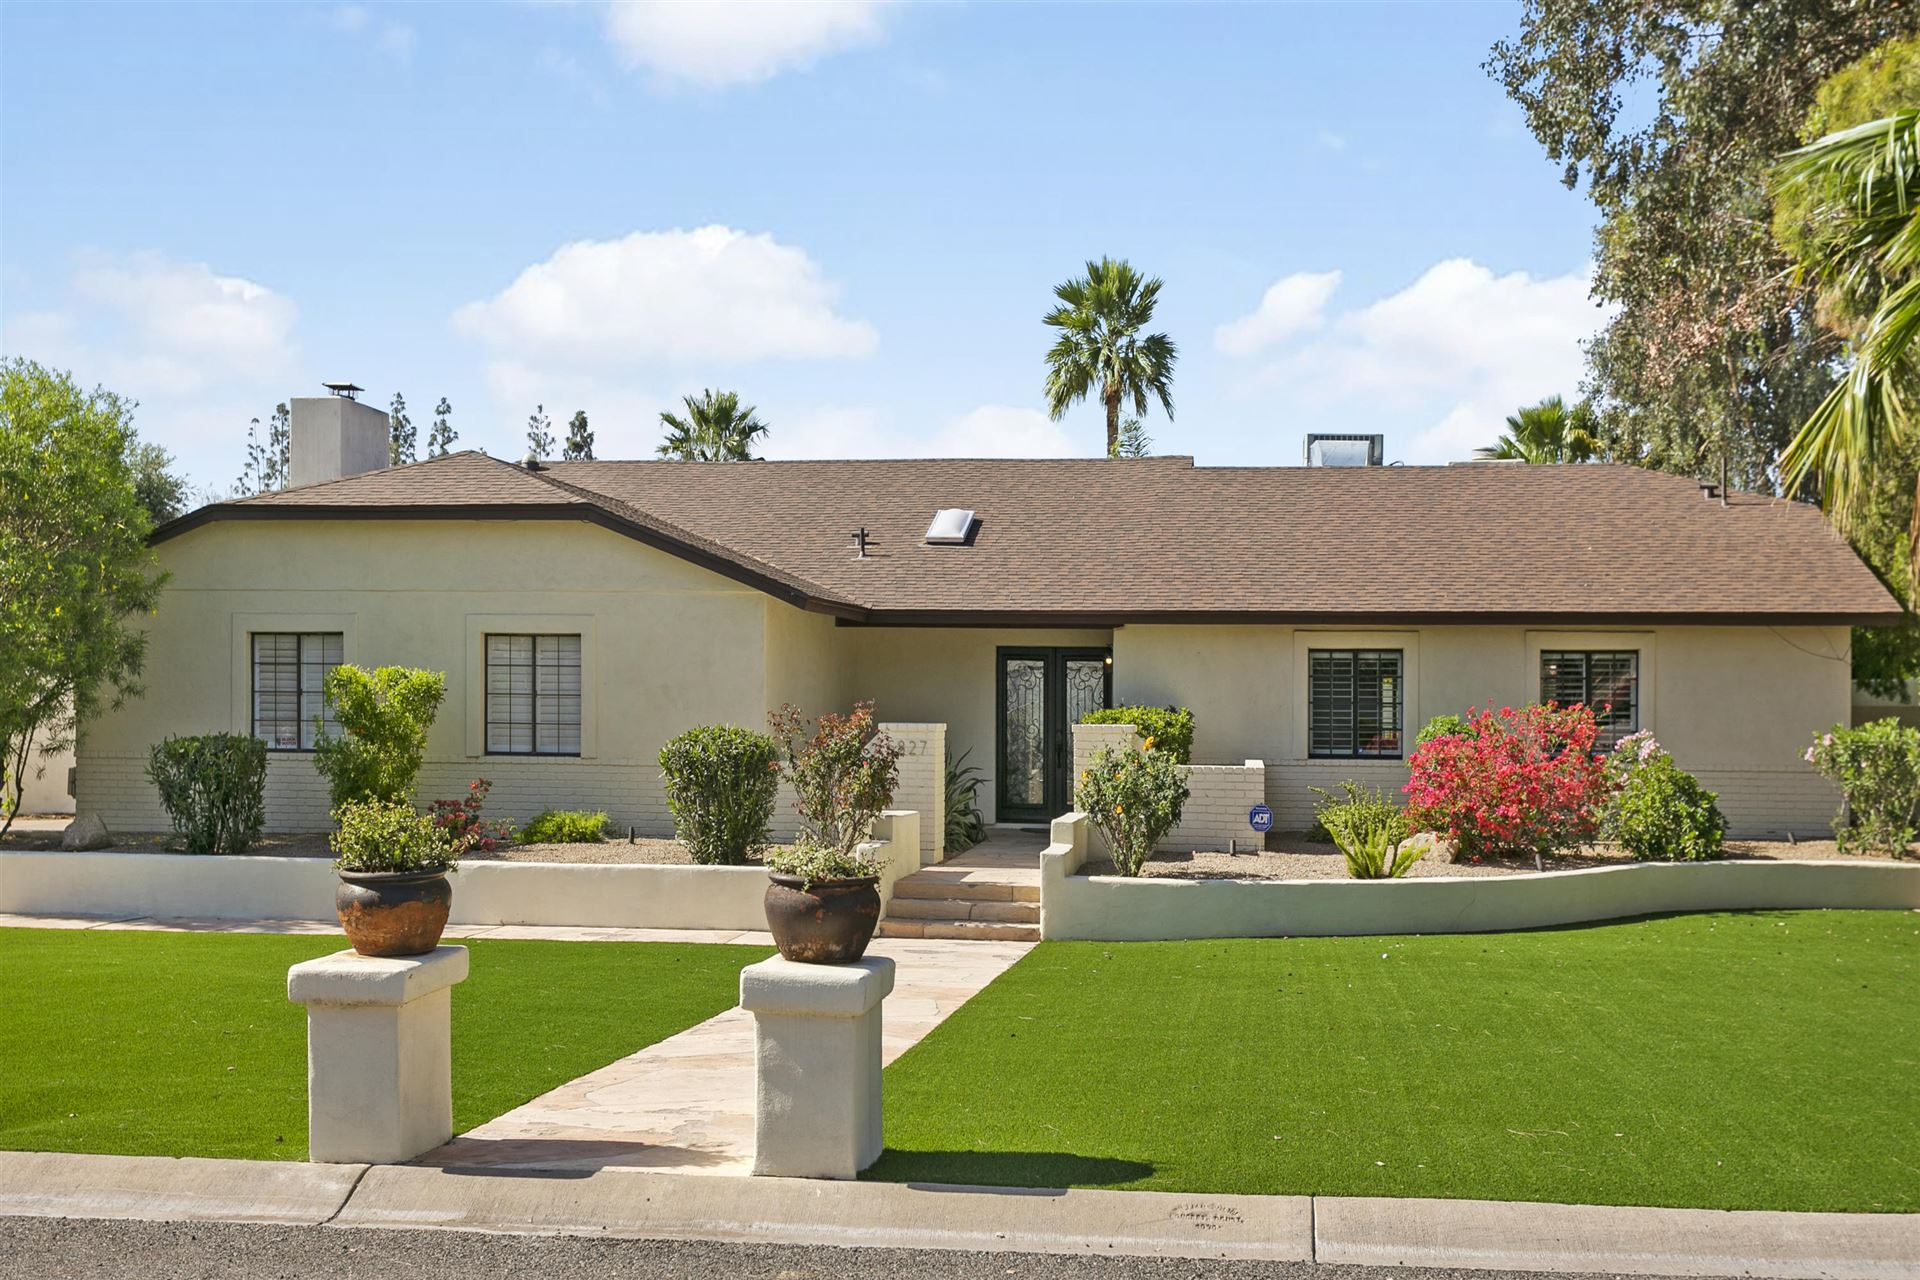 5827 E ANGELA Drive, Scottsdale, AZ 85254 - MLS#: 6226849